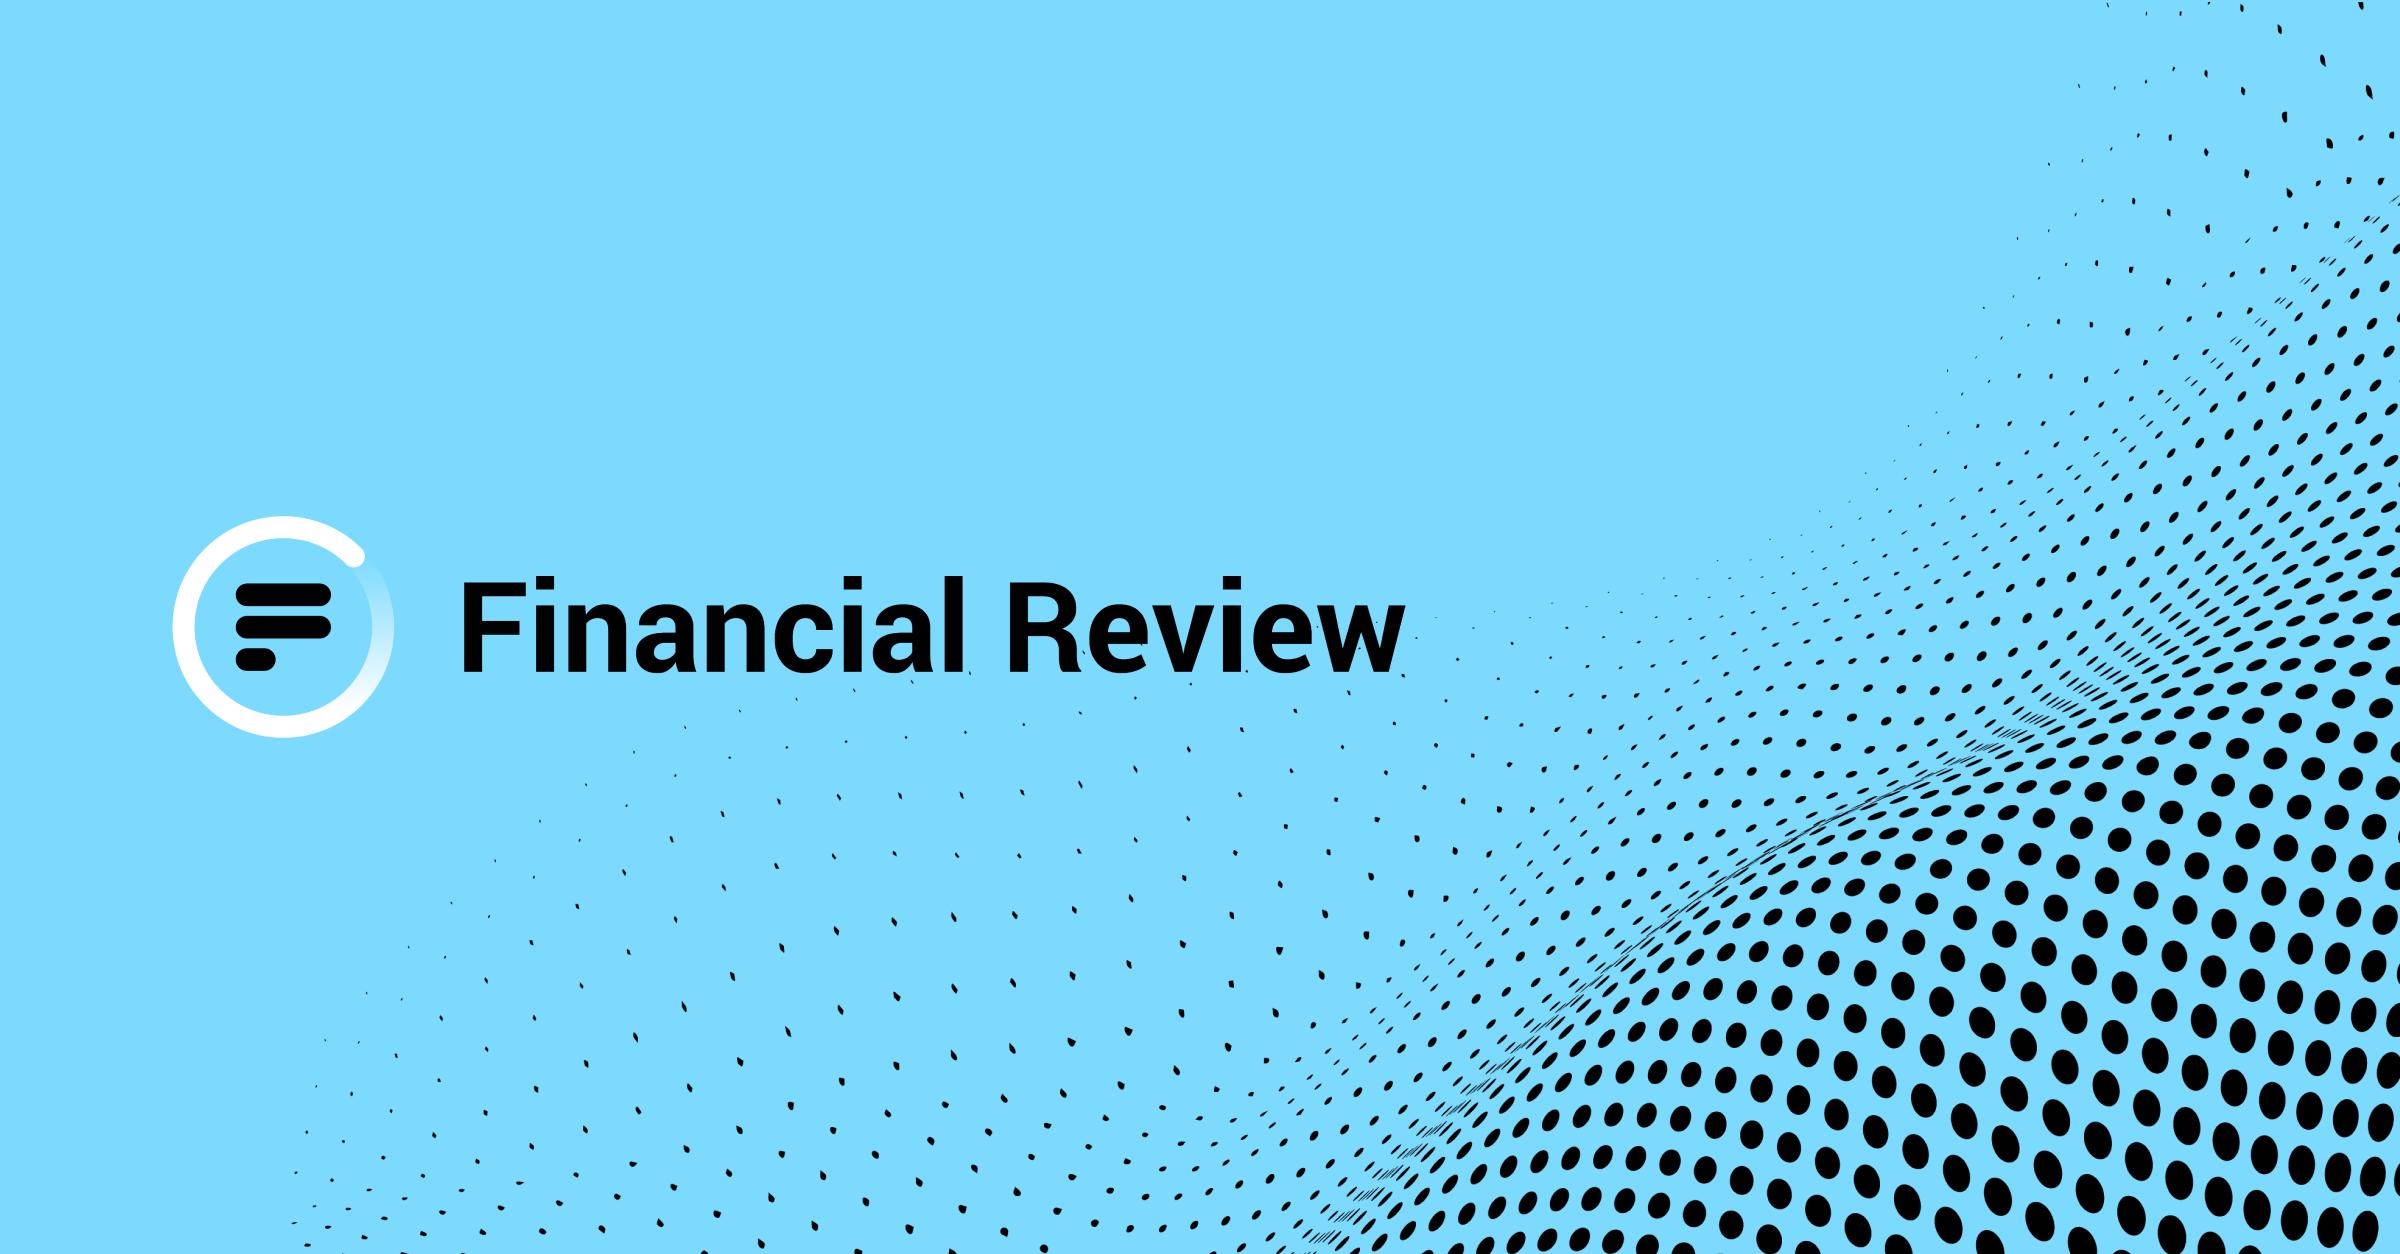 Financial Review Factsheet